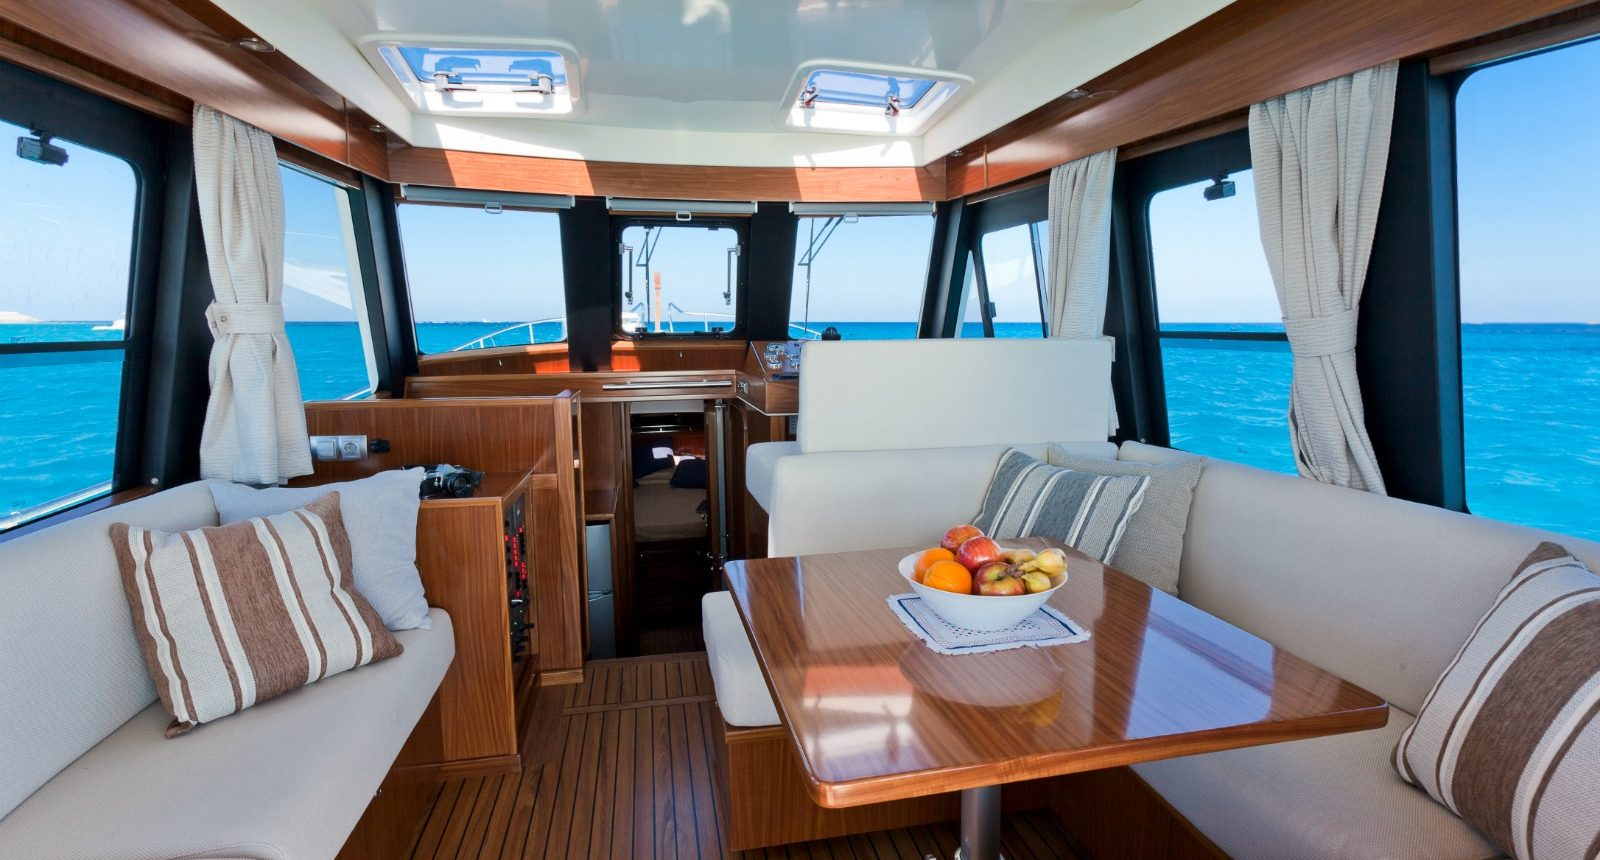 Minorca Islander 42 yacht for sale - salon